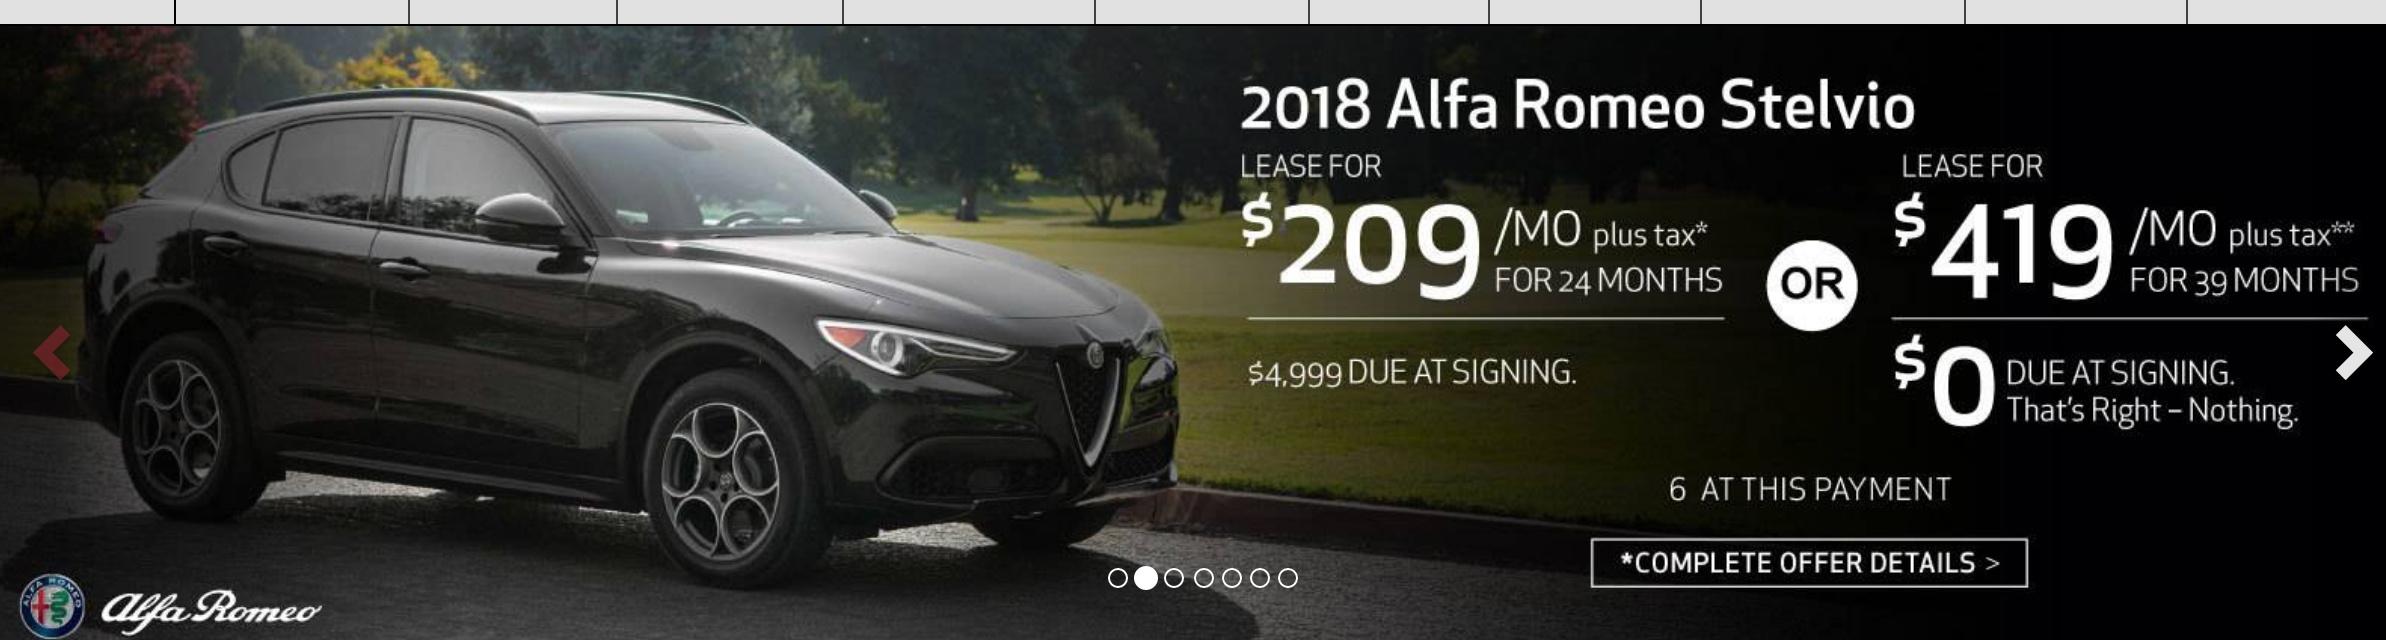 Alfa Romeo Stelvio Ti Sport Msrp 53690 24 10k 420 W 0 Down